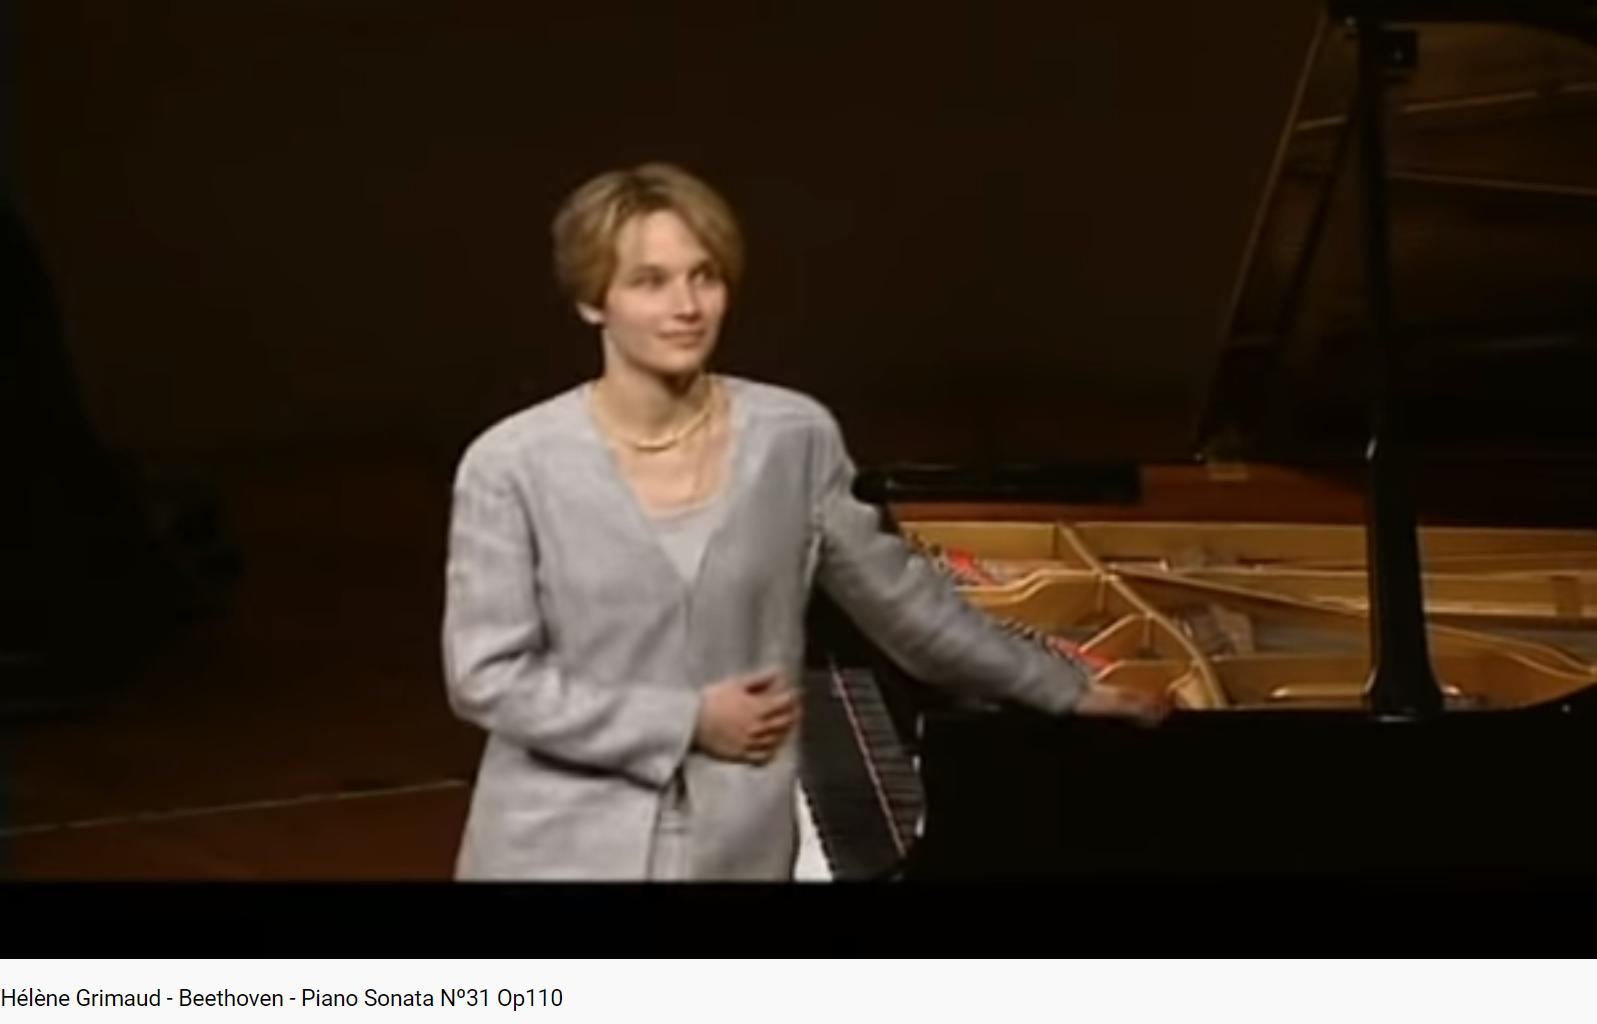 Beethoven opus 110